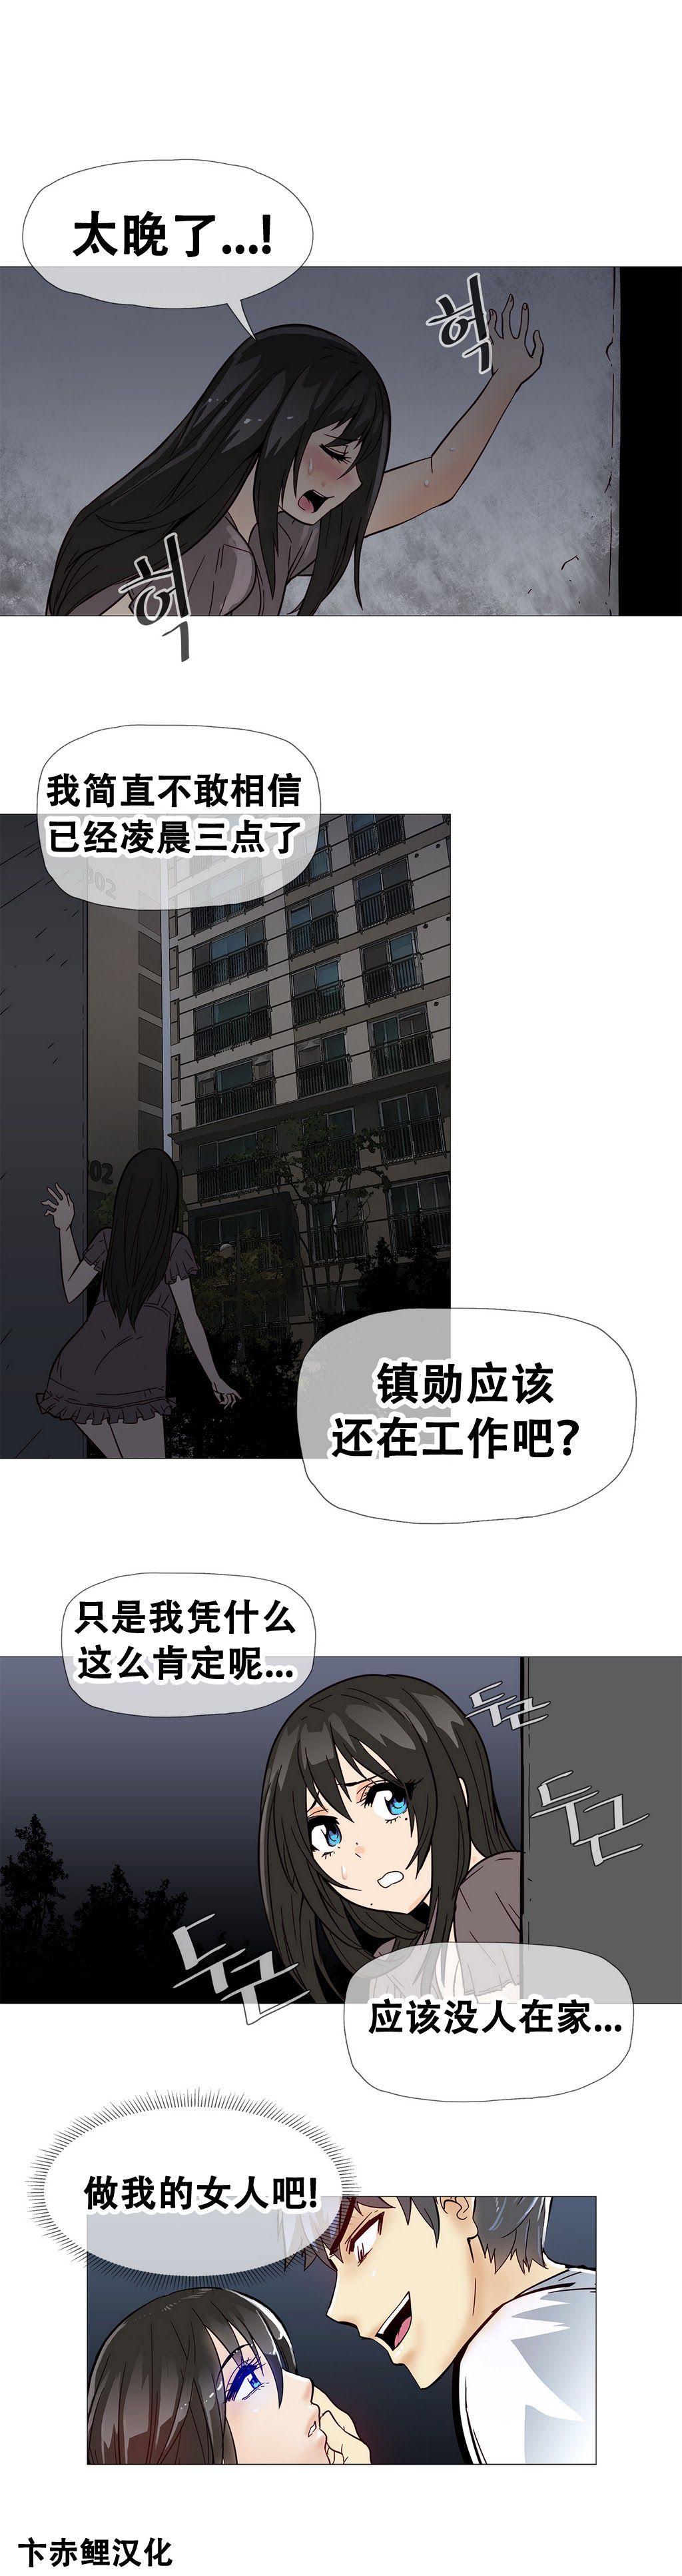 HouseHold Affairs 【卞赤鲤汉化】1~15话 218